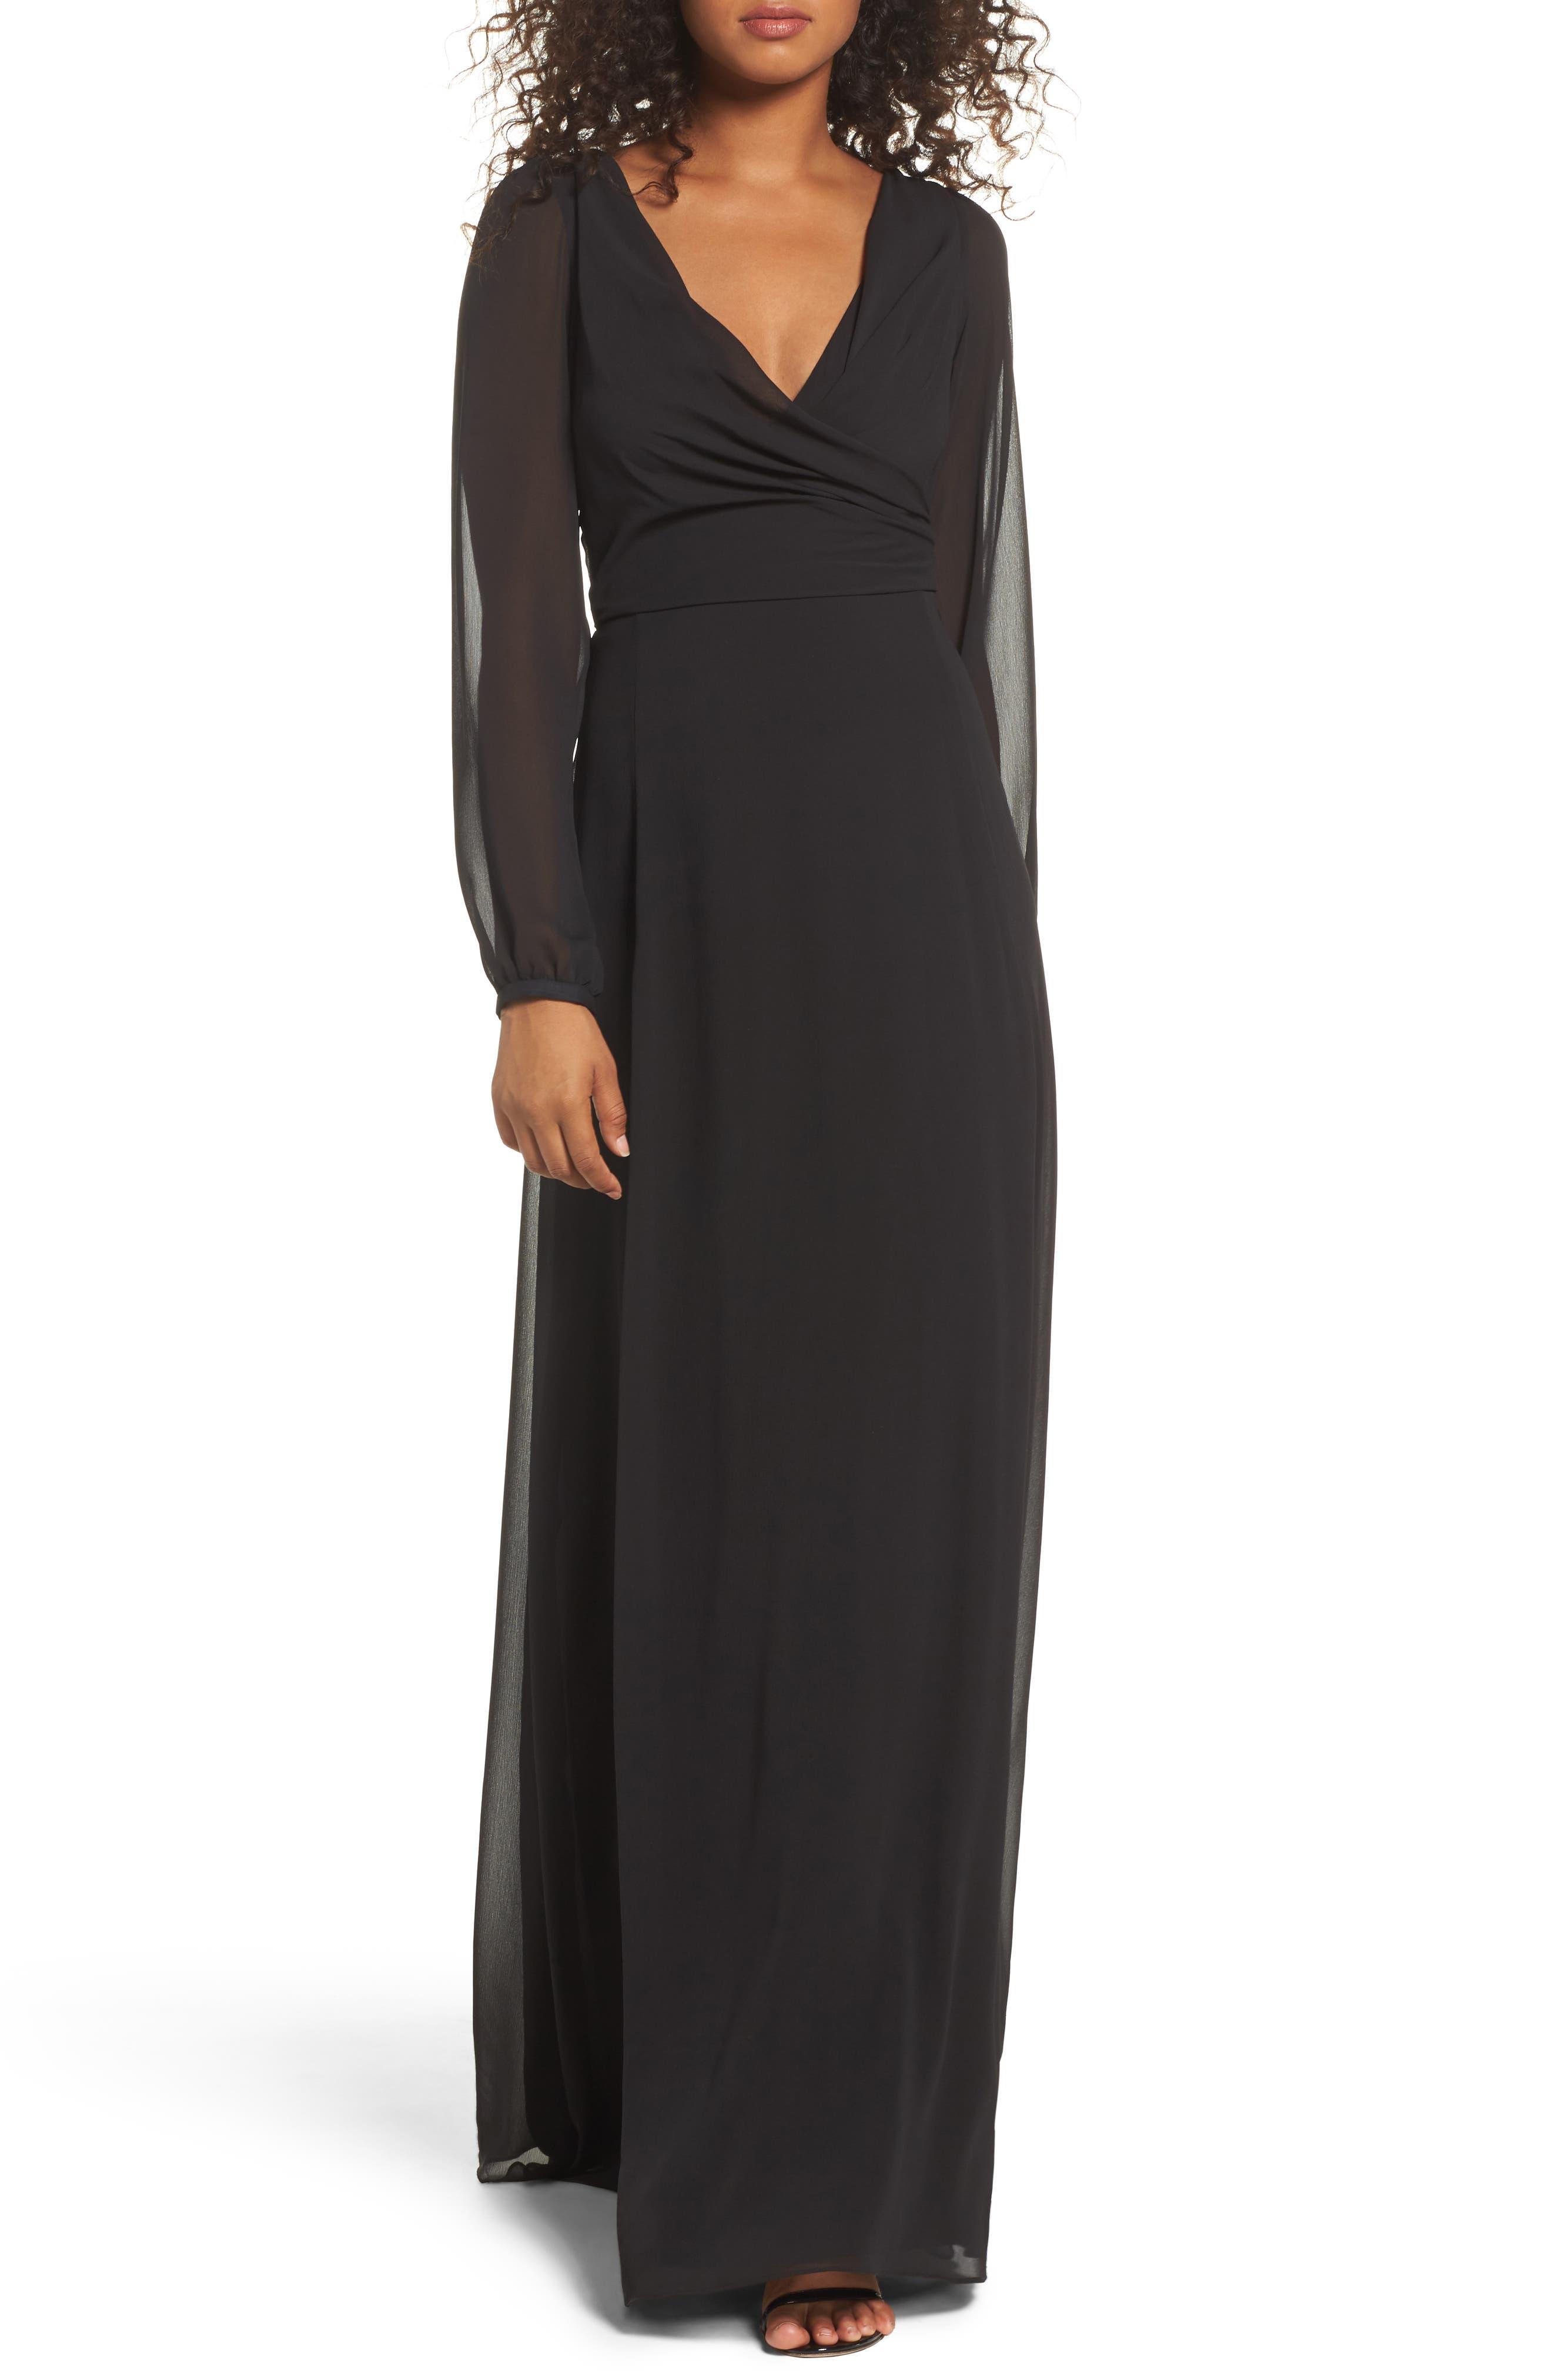 Donna Luxe Chiffon Surplice A-Line Gown,                             Main thumbnail 1, color,                             001